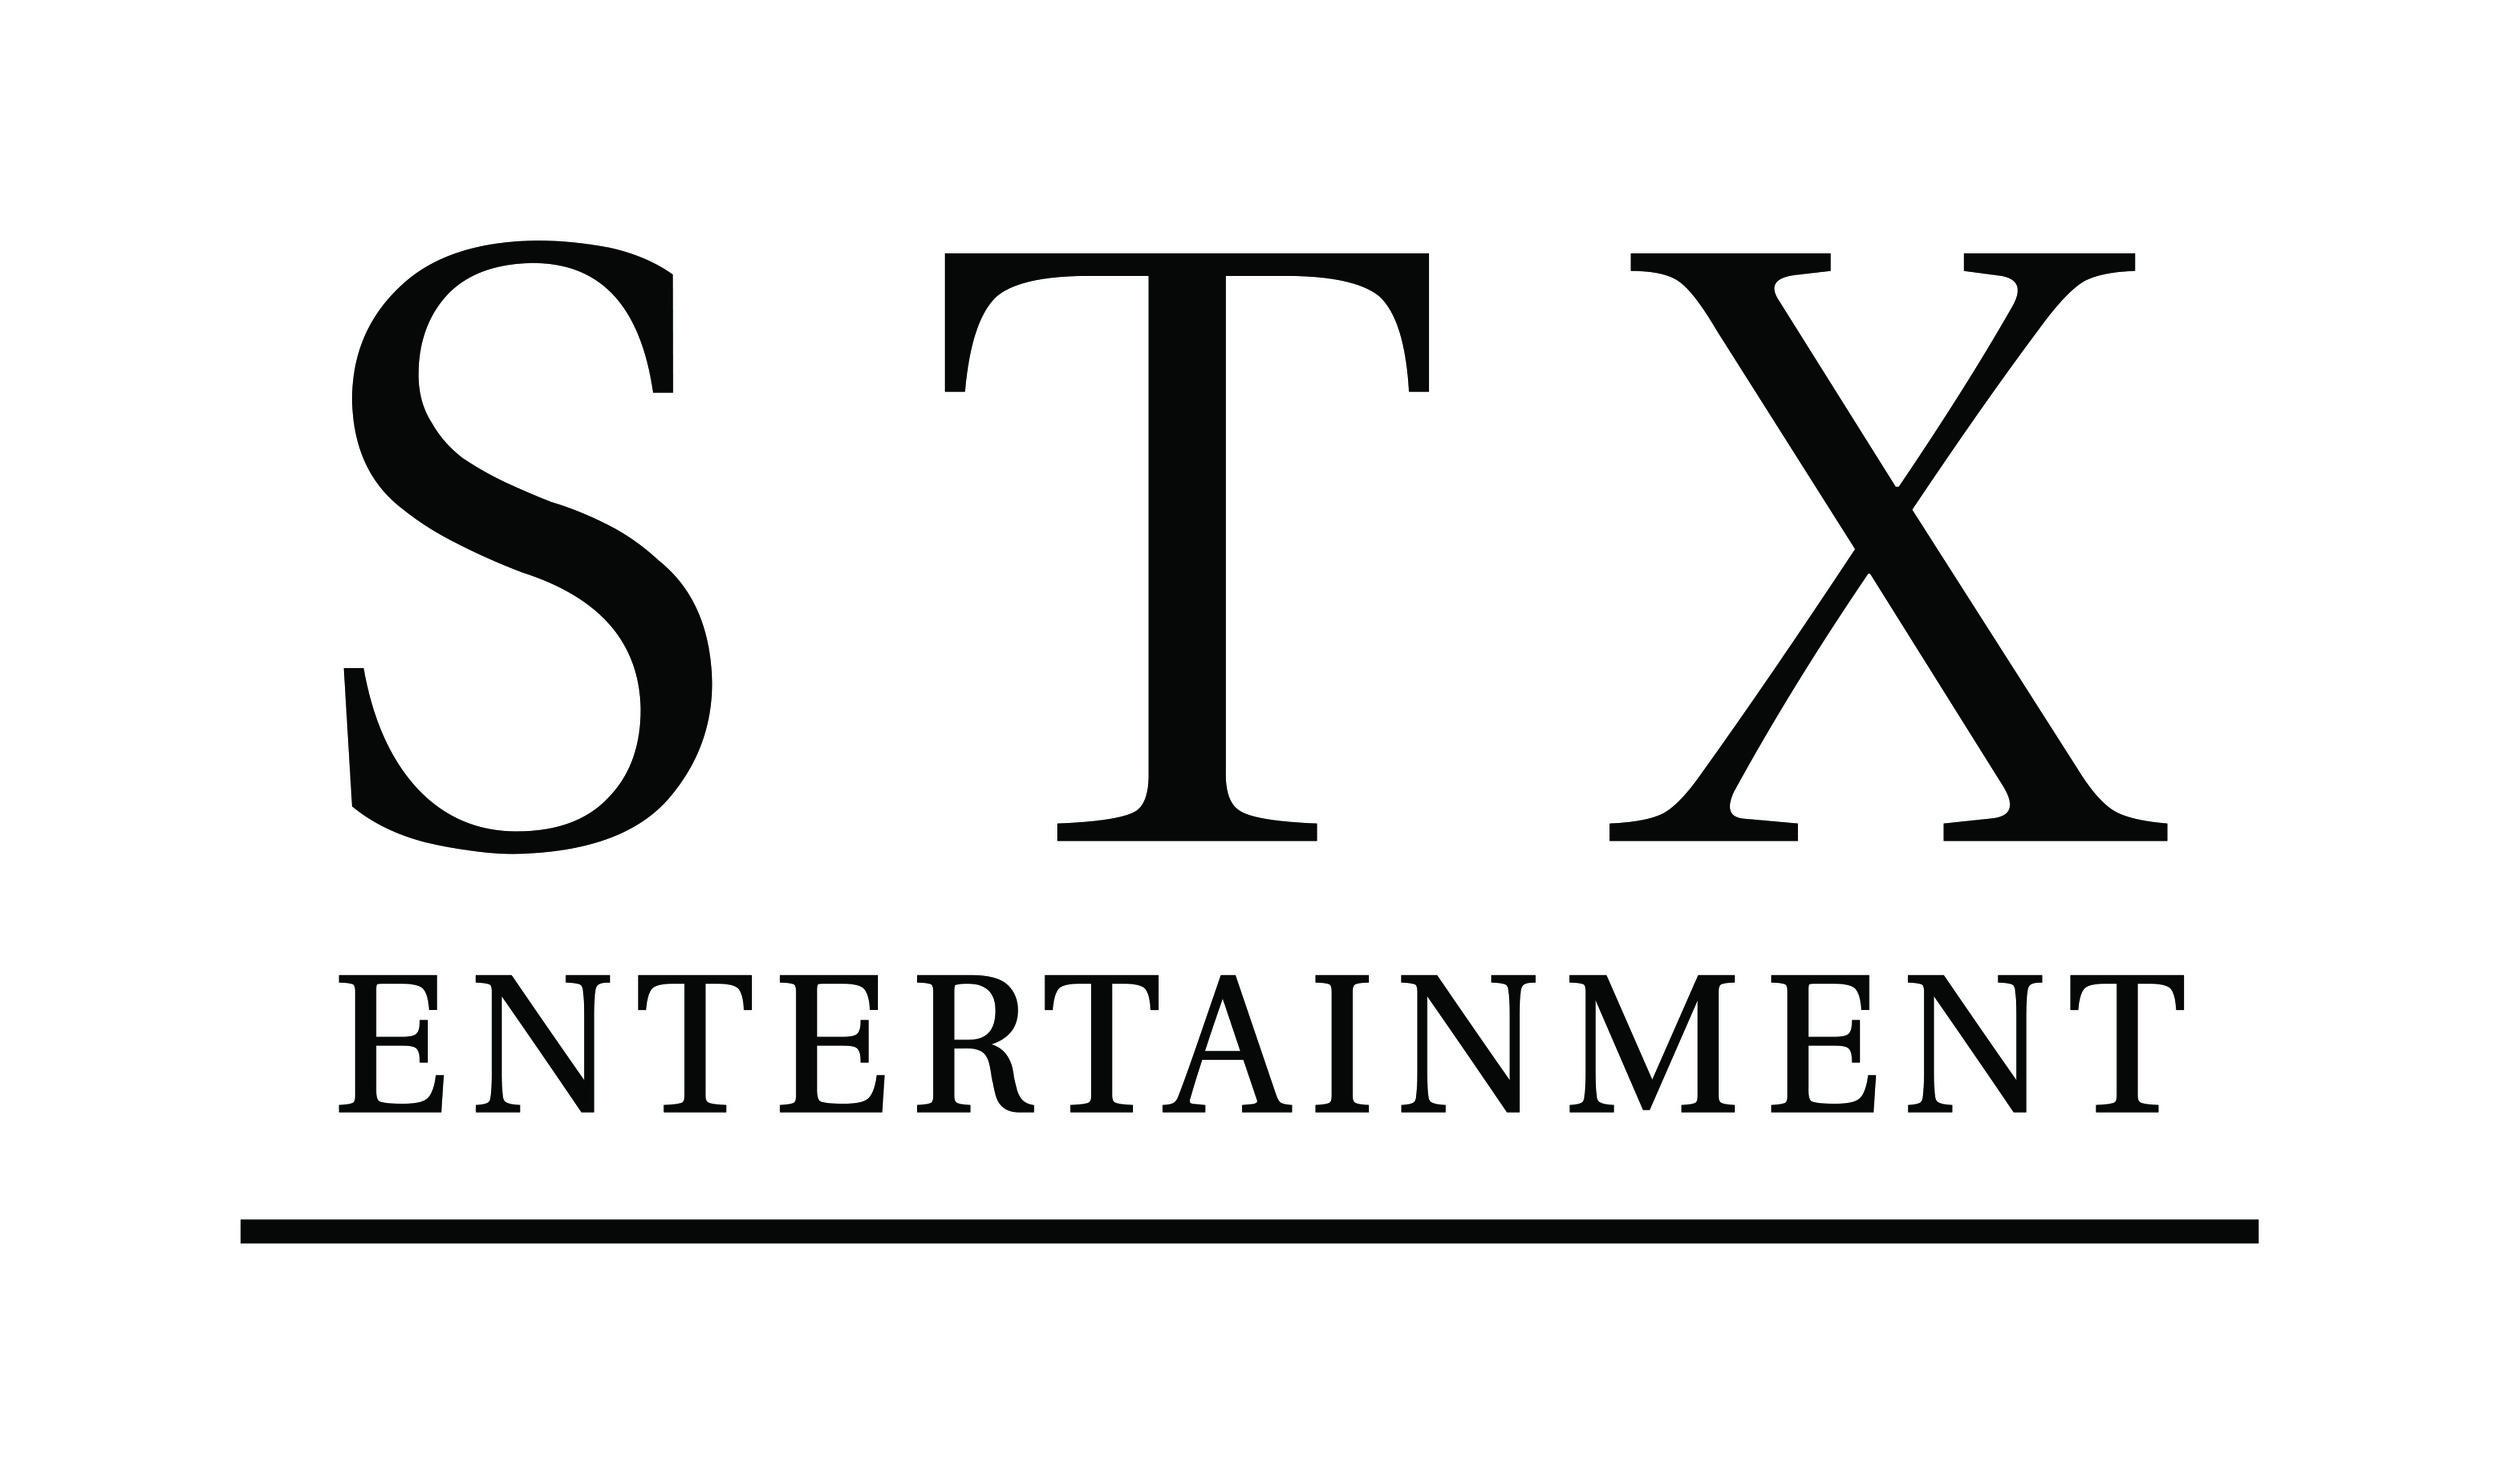 STX_Entertainment.jpg